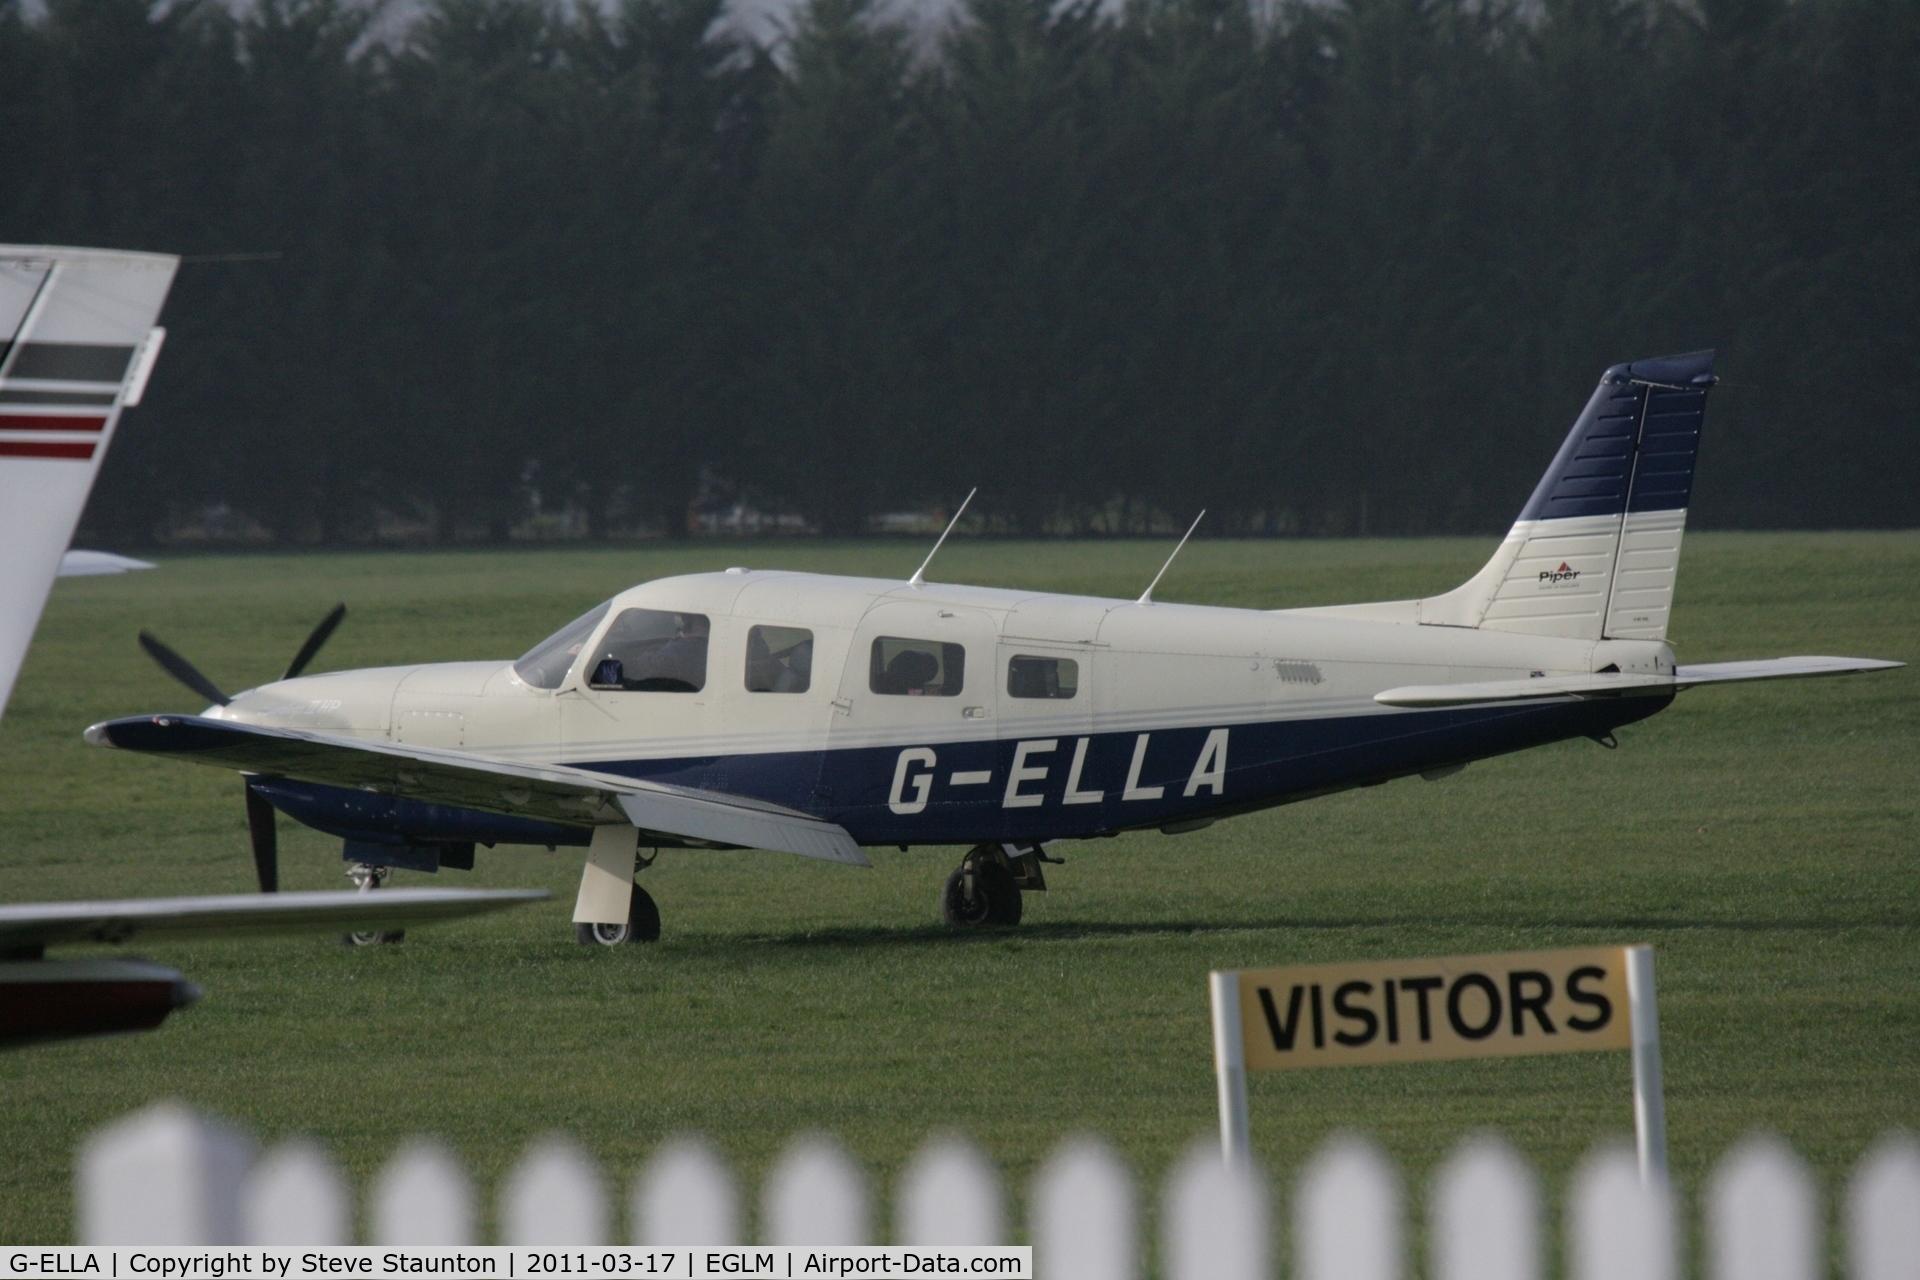 G-ELLA, 1996 Piper PA-32R-301 Saratoga SP C/N 3246050, Taken at White Waltham Airfield March 2011